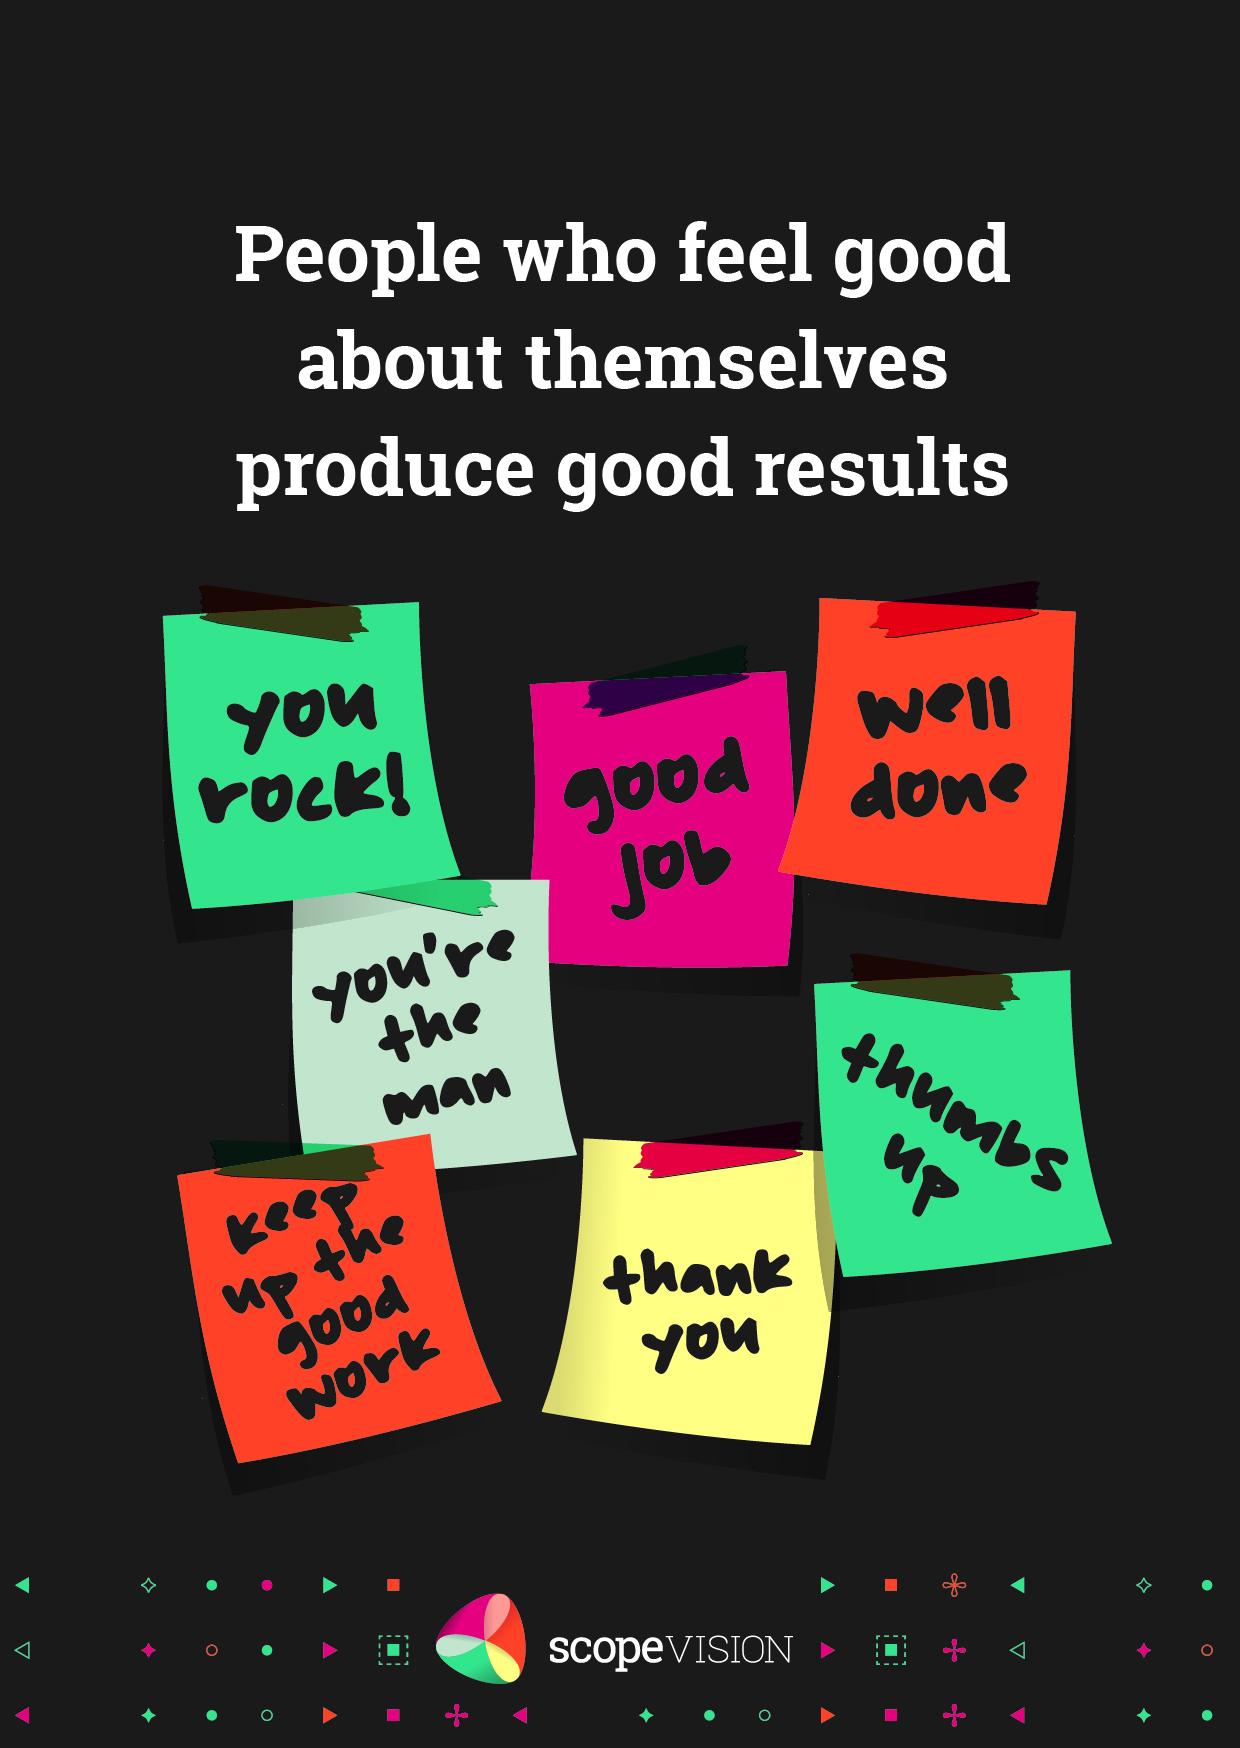 People feel good